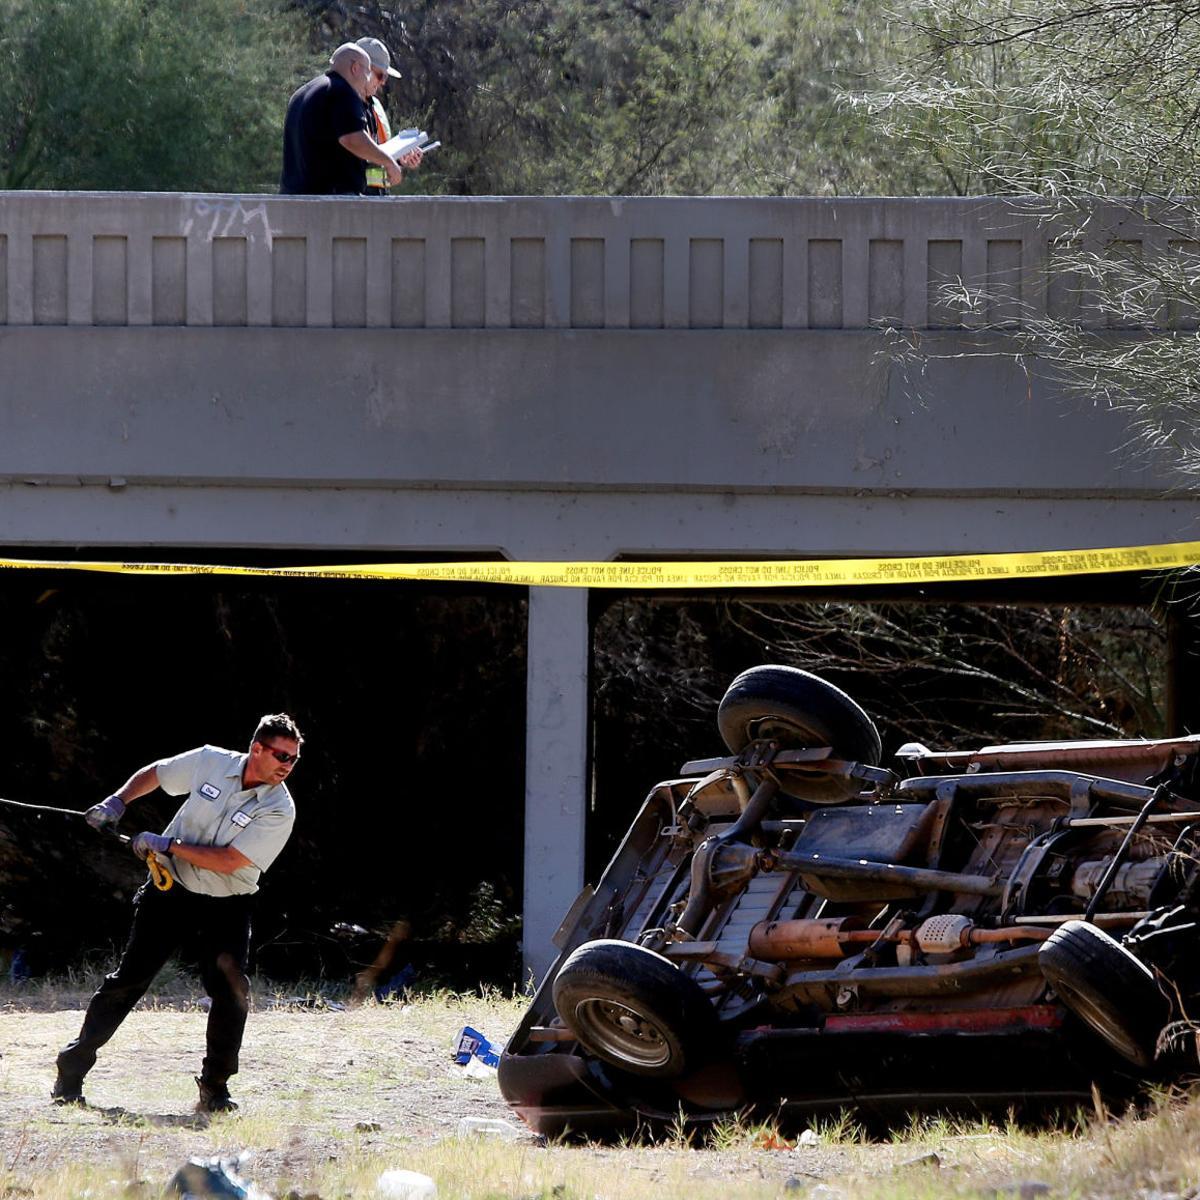 Police investigating fatal crash on Tucson's southwest side | Local